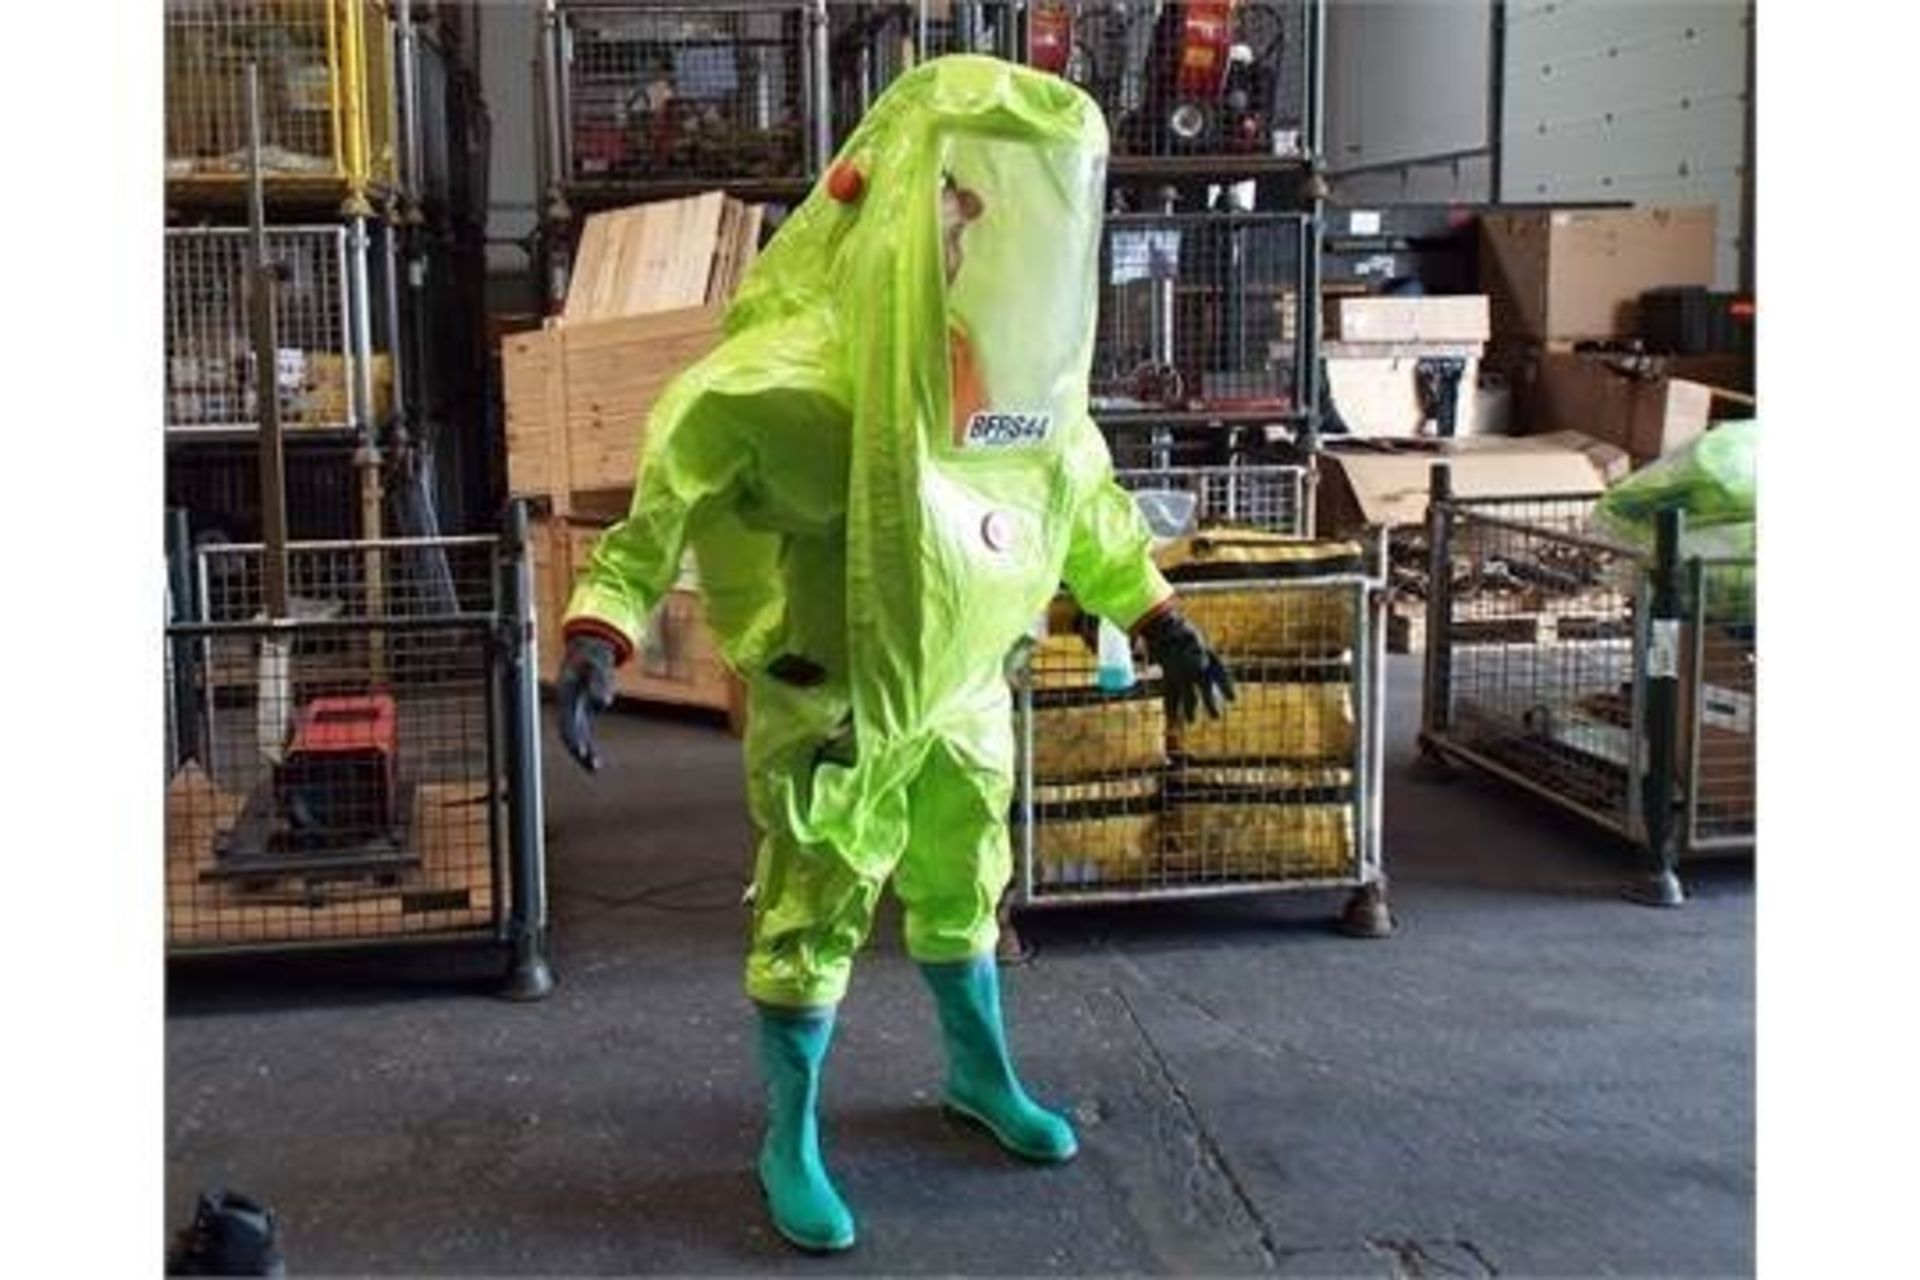 Lotto 26409 - Q10 x Unissued Respirex Tychem TK Gas-Tight Hazmat Suit Type 1A